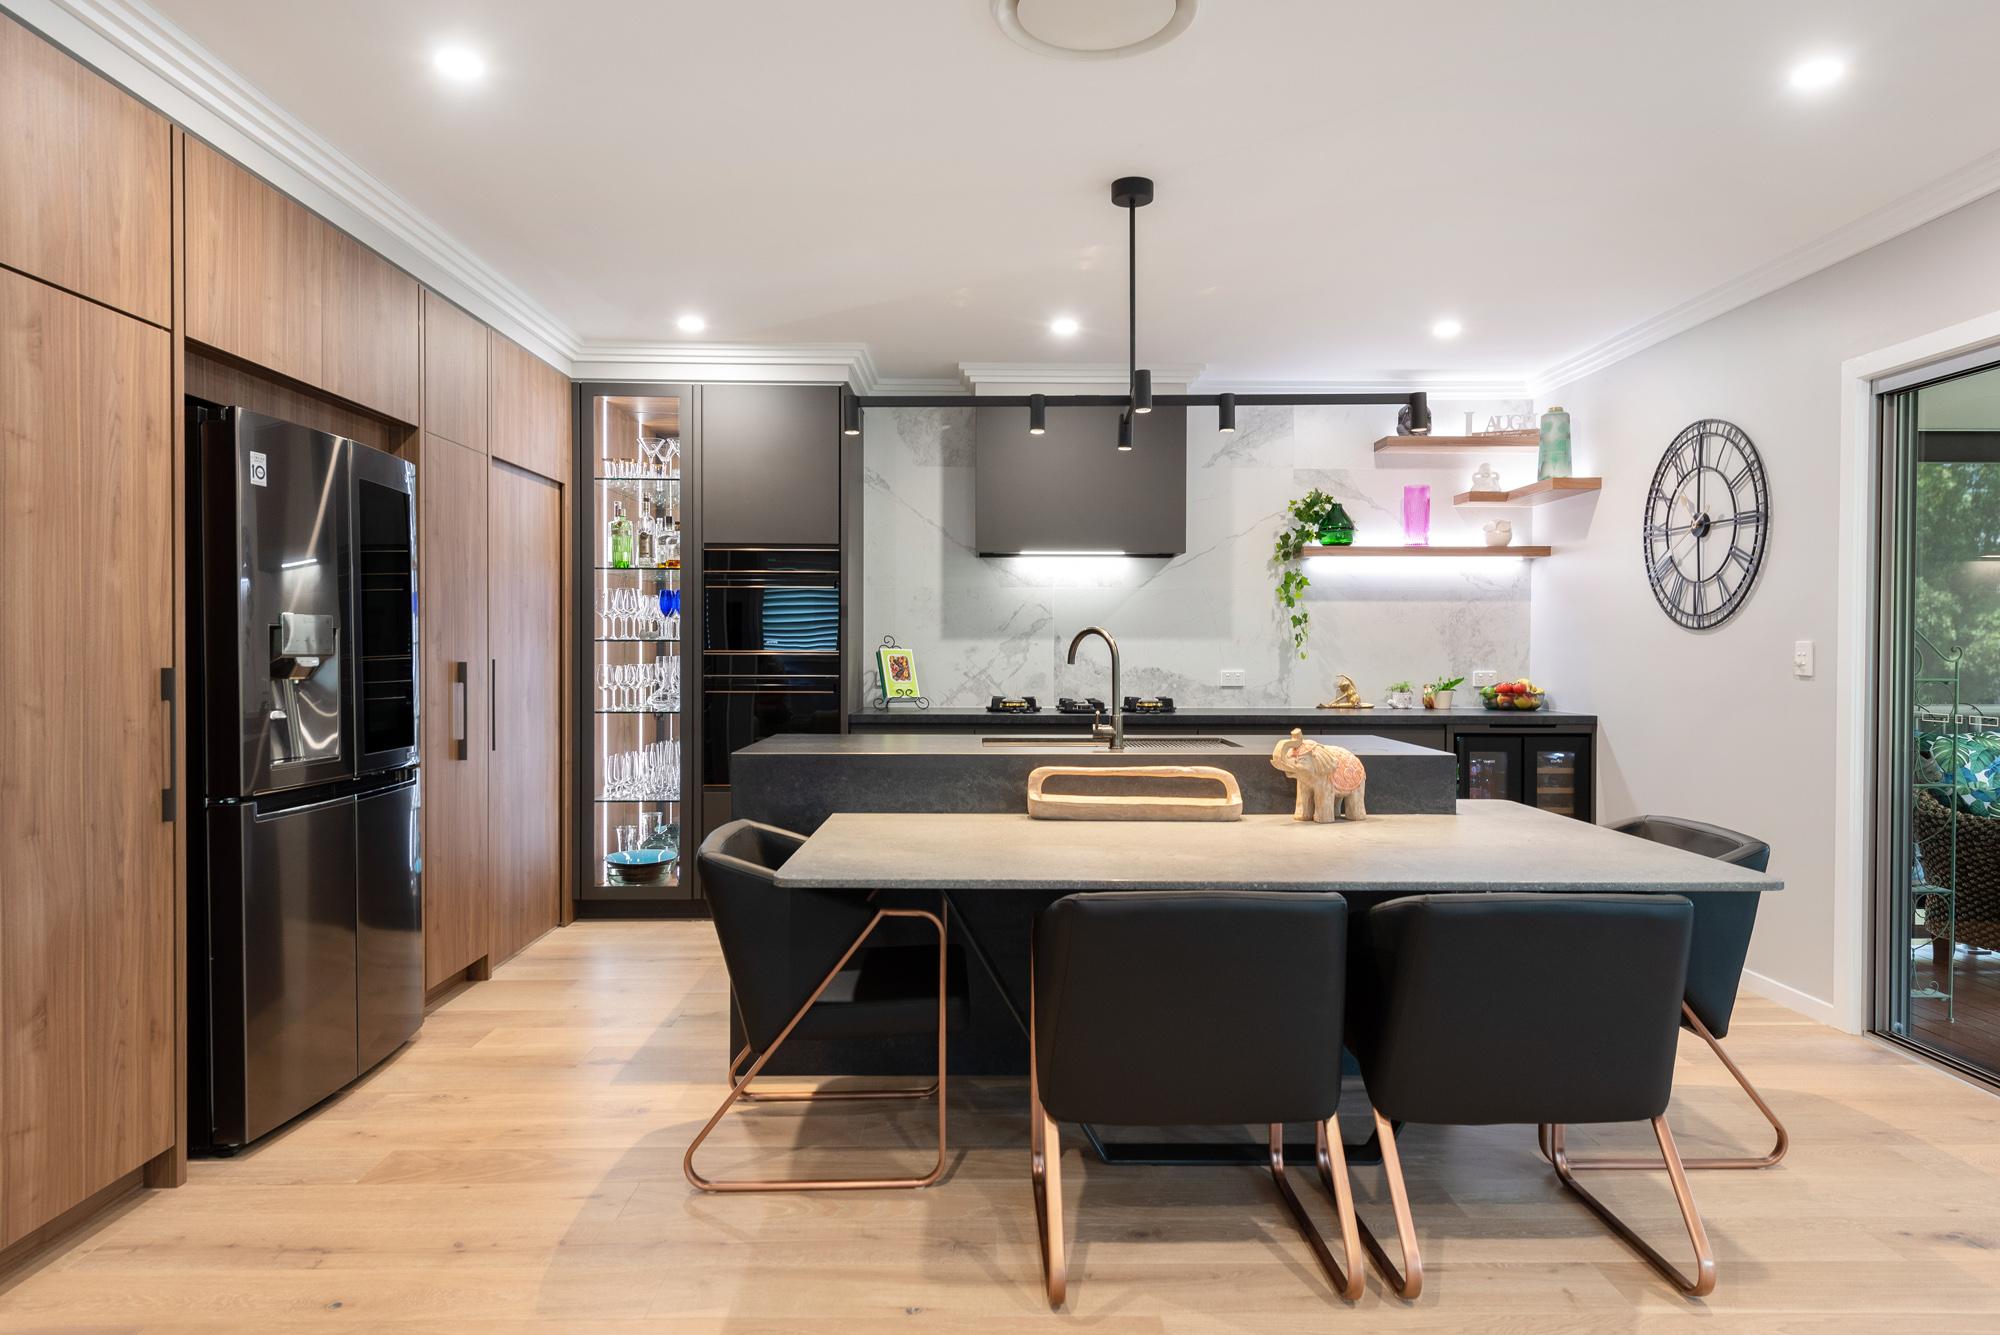 Modern industrial kitchen, concrete benchtops, marble tile splashback, feature timber cabinetry, black pendant light, glass display unit